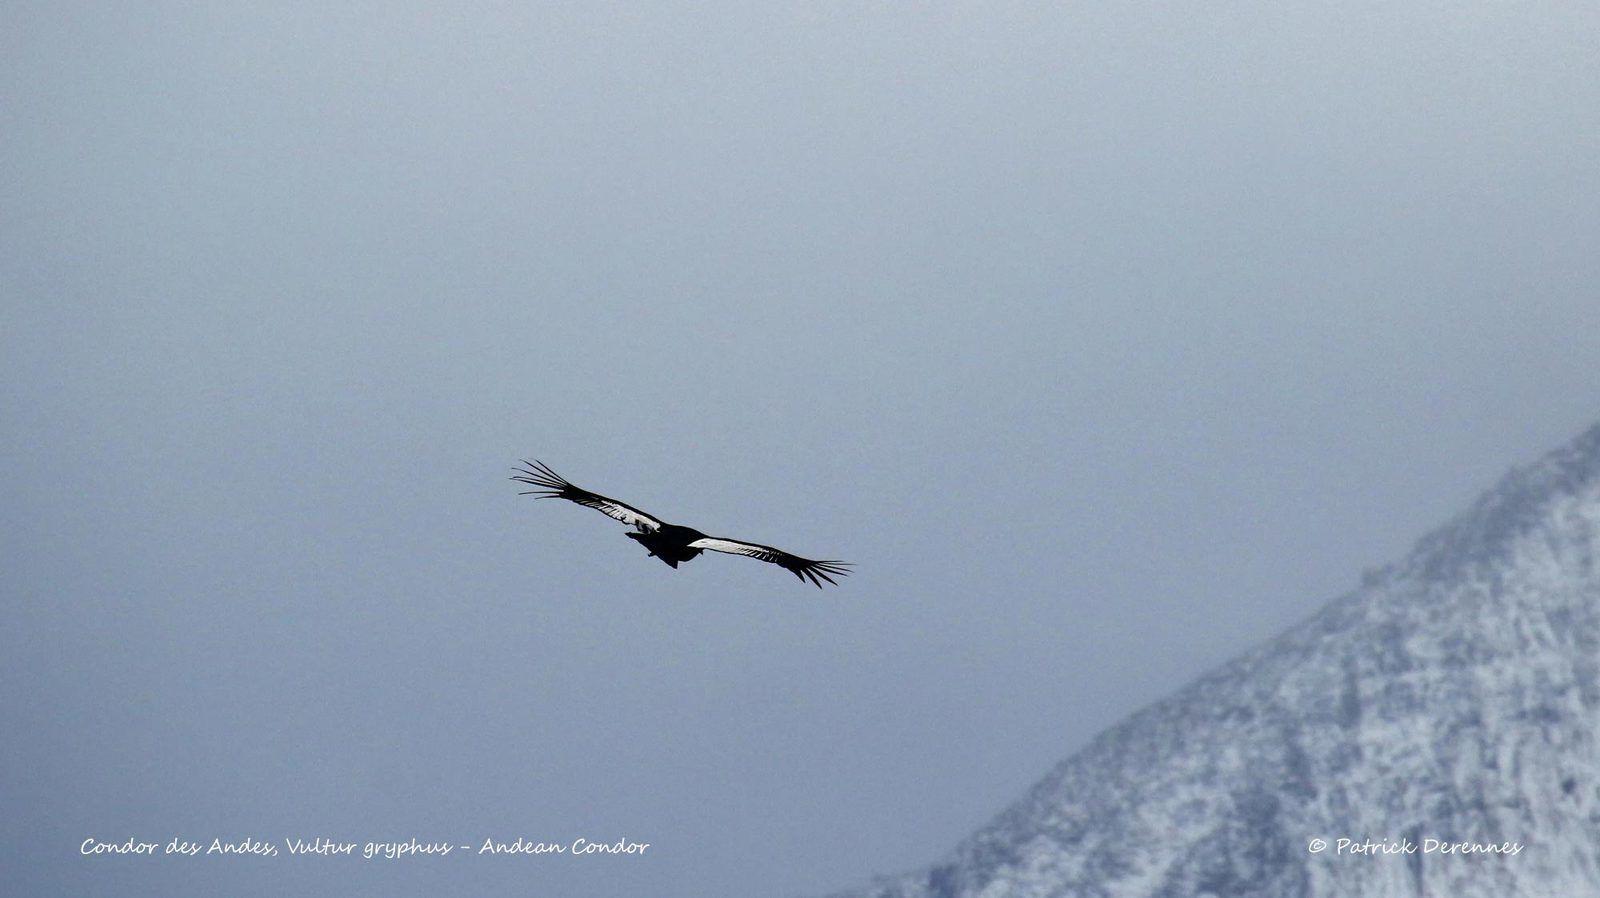 [Chili] Torres del Paine - Condor des Andes 1/3